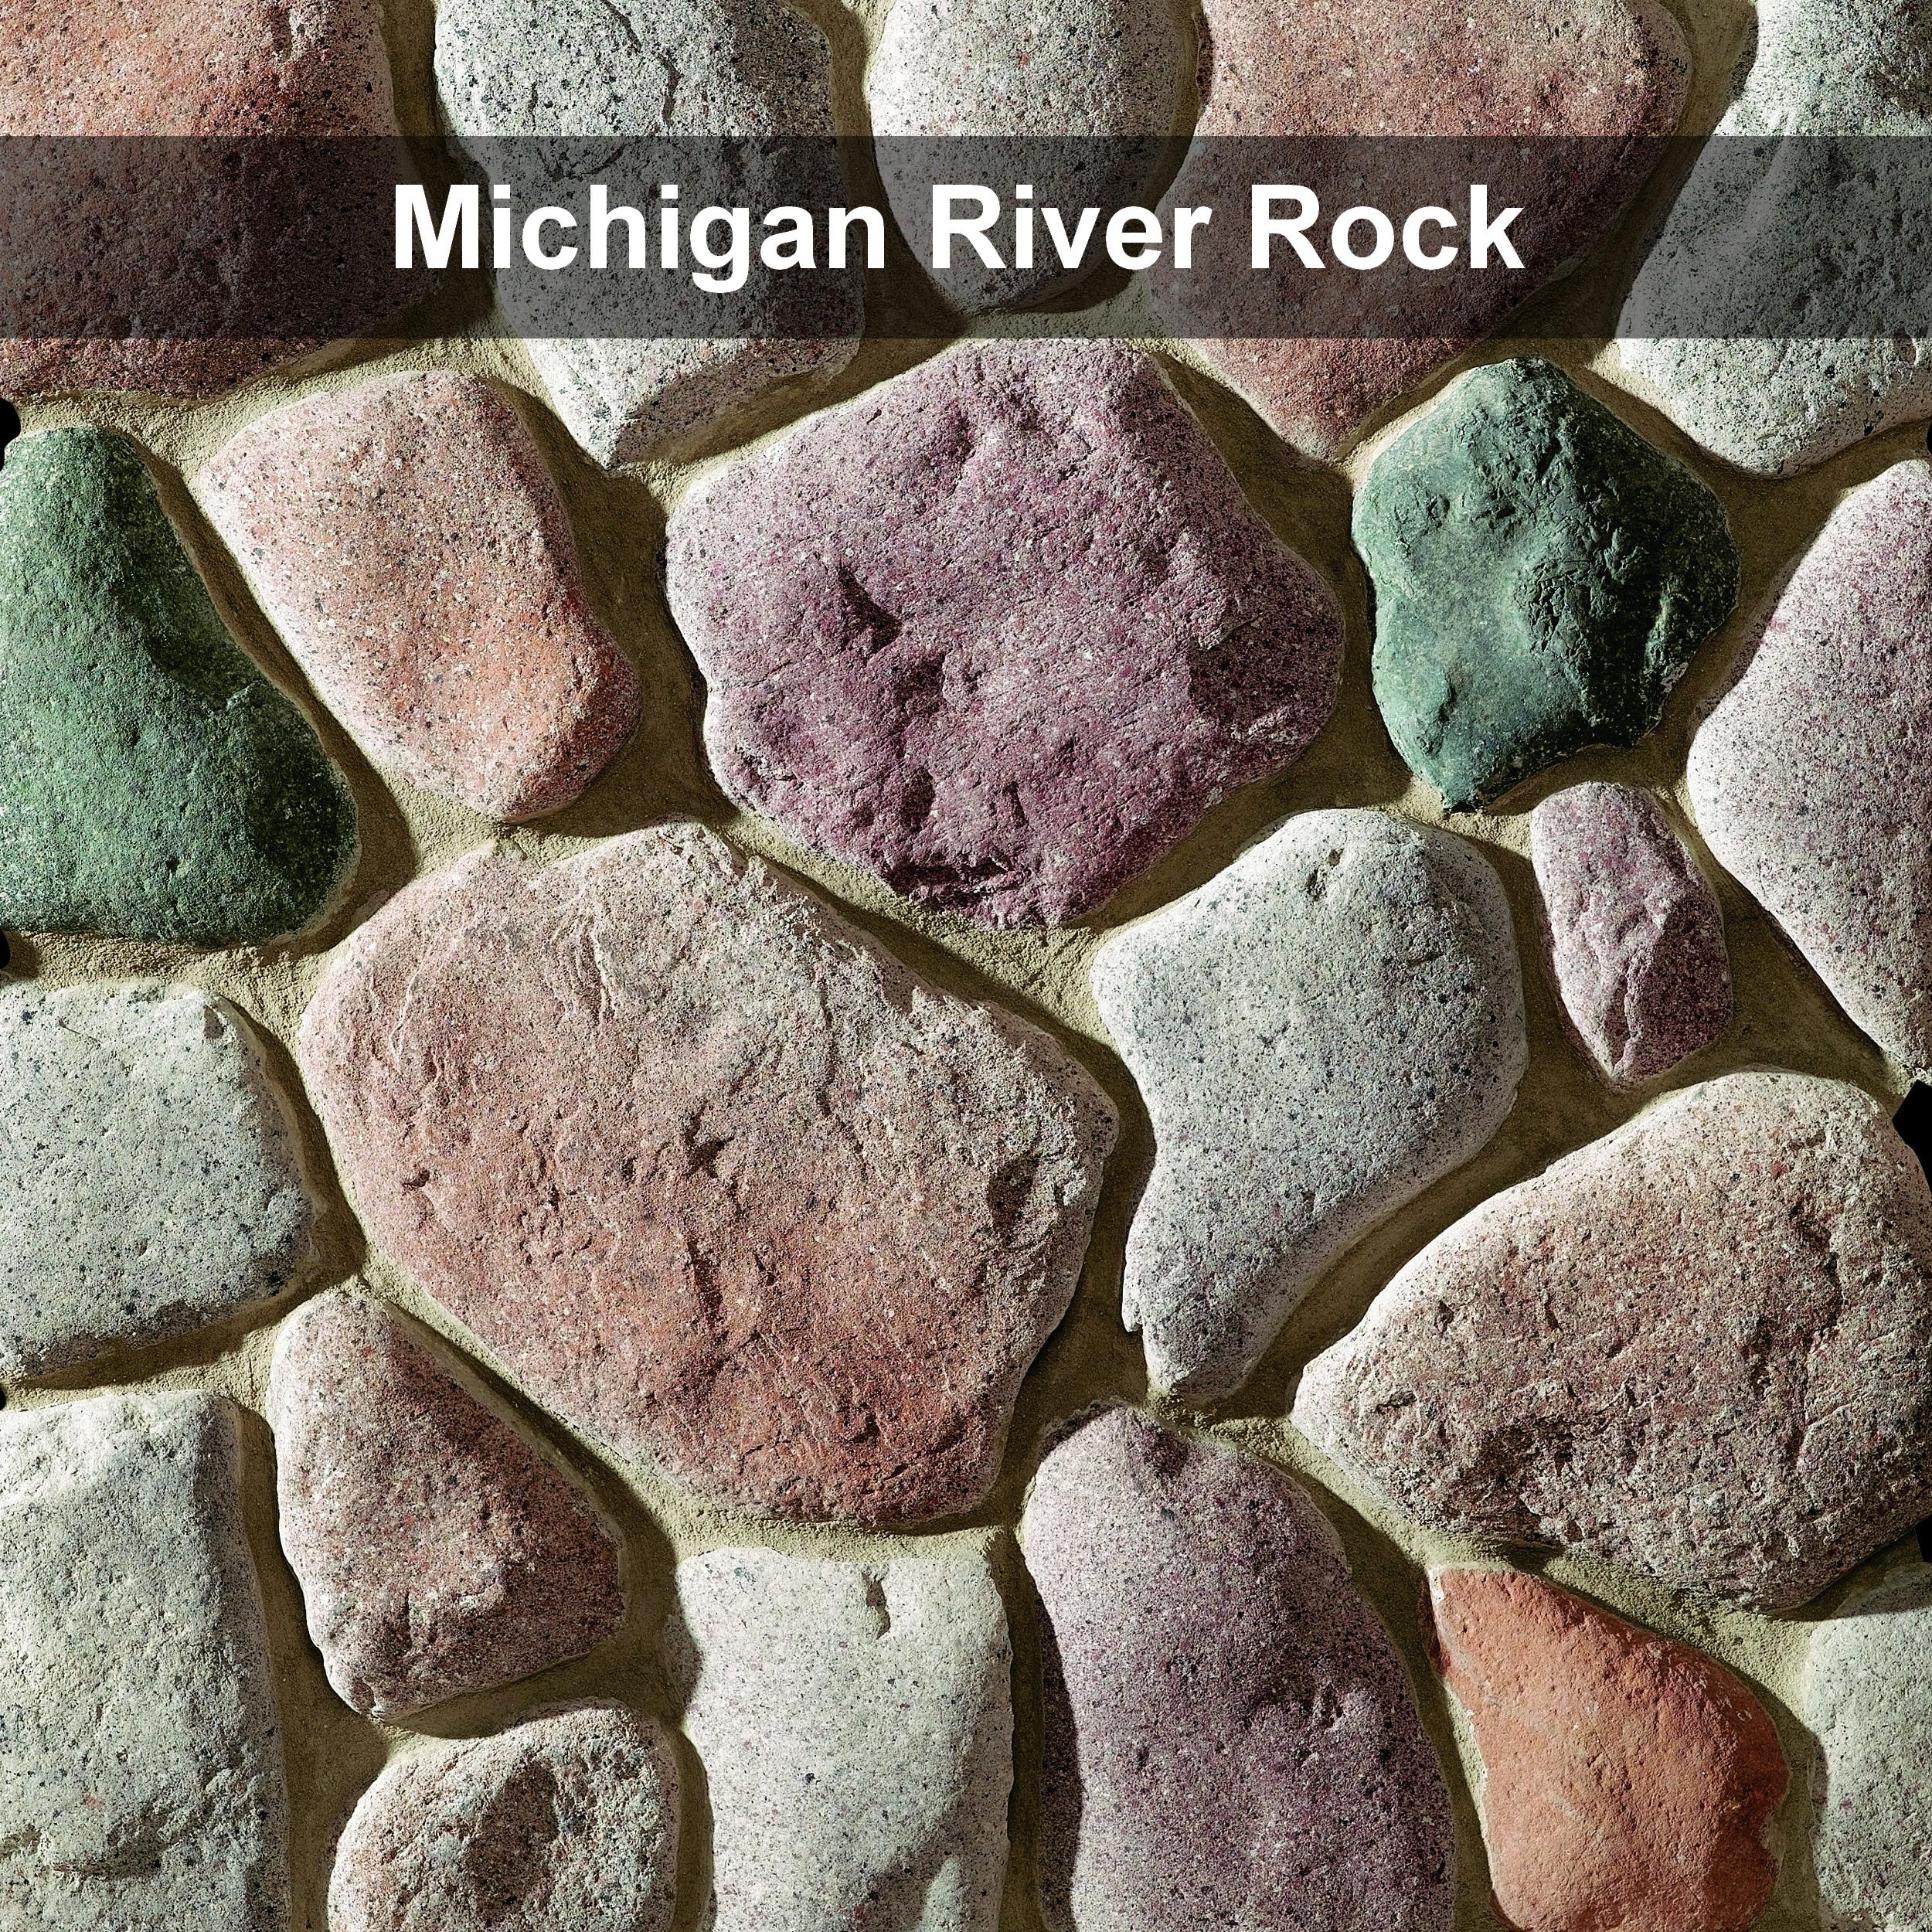 DQ_River Rock_Michigan_Profile.jpg